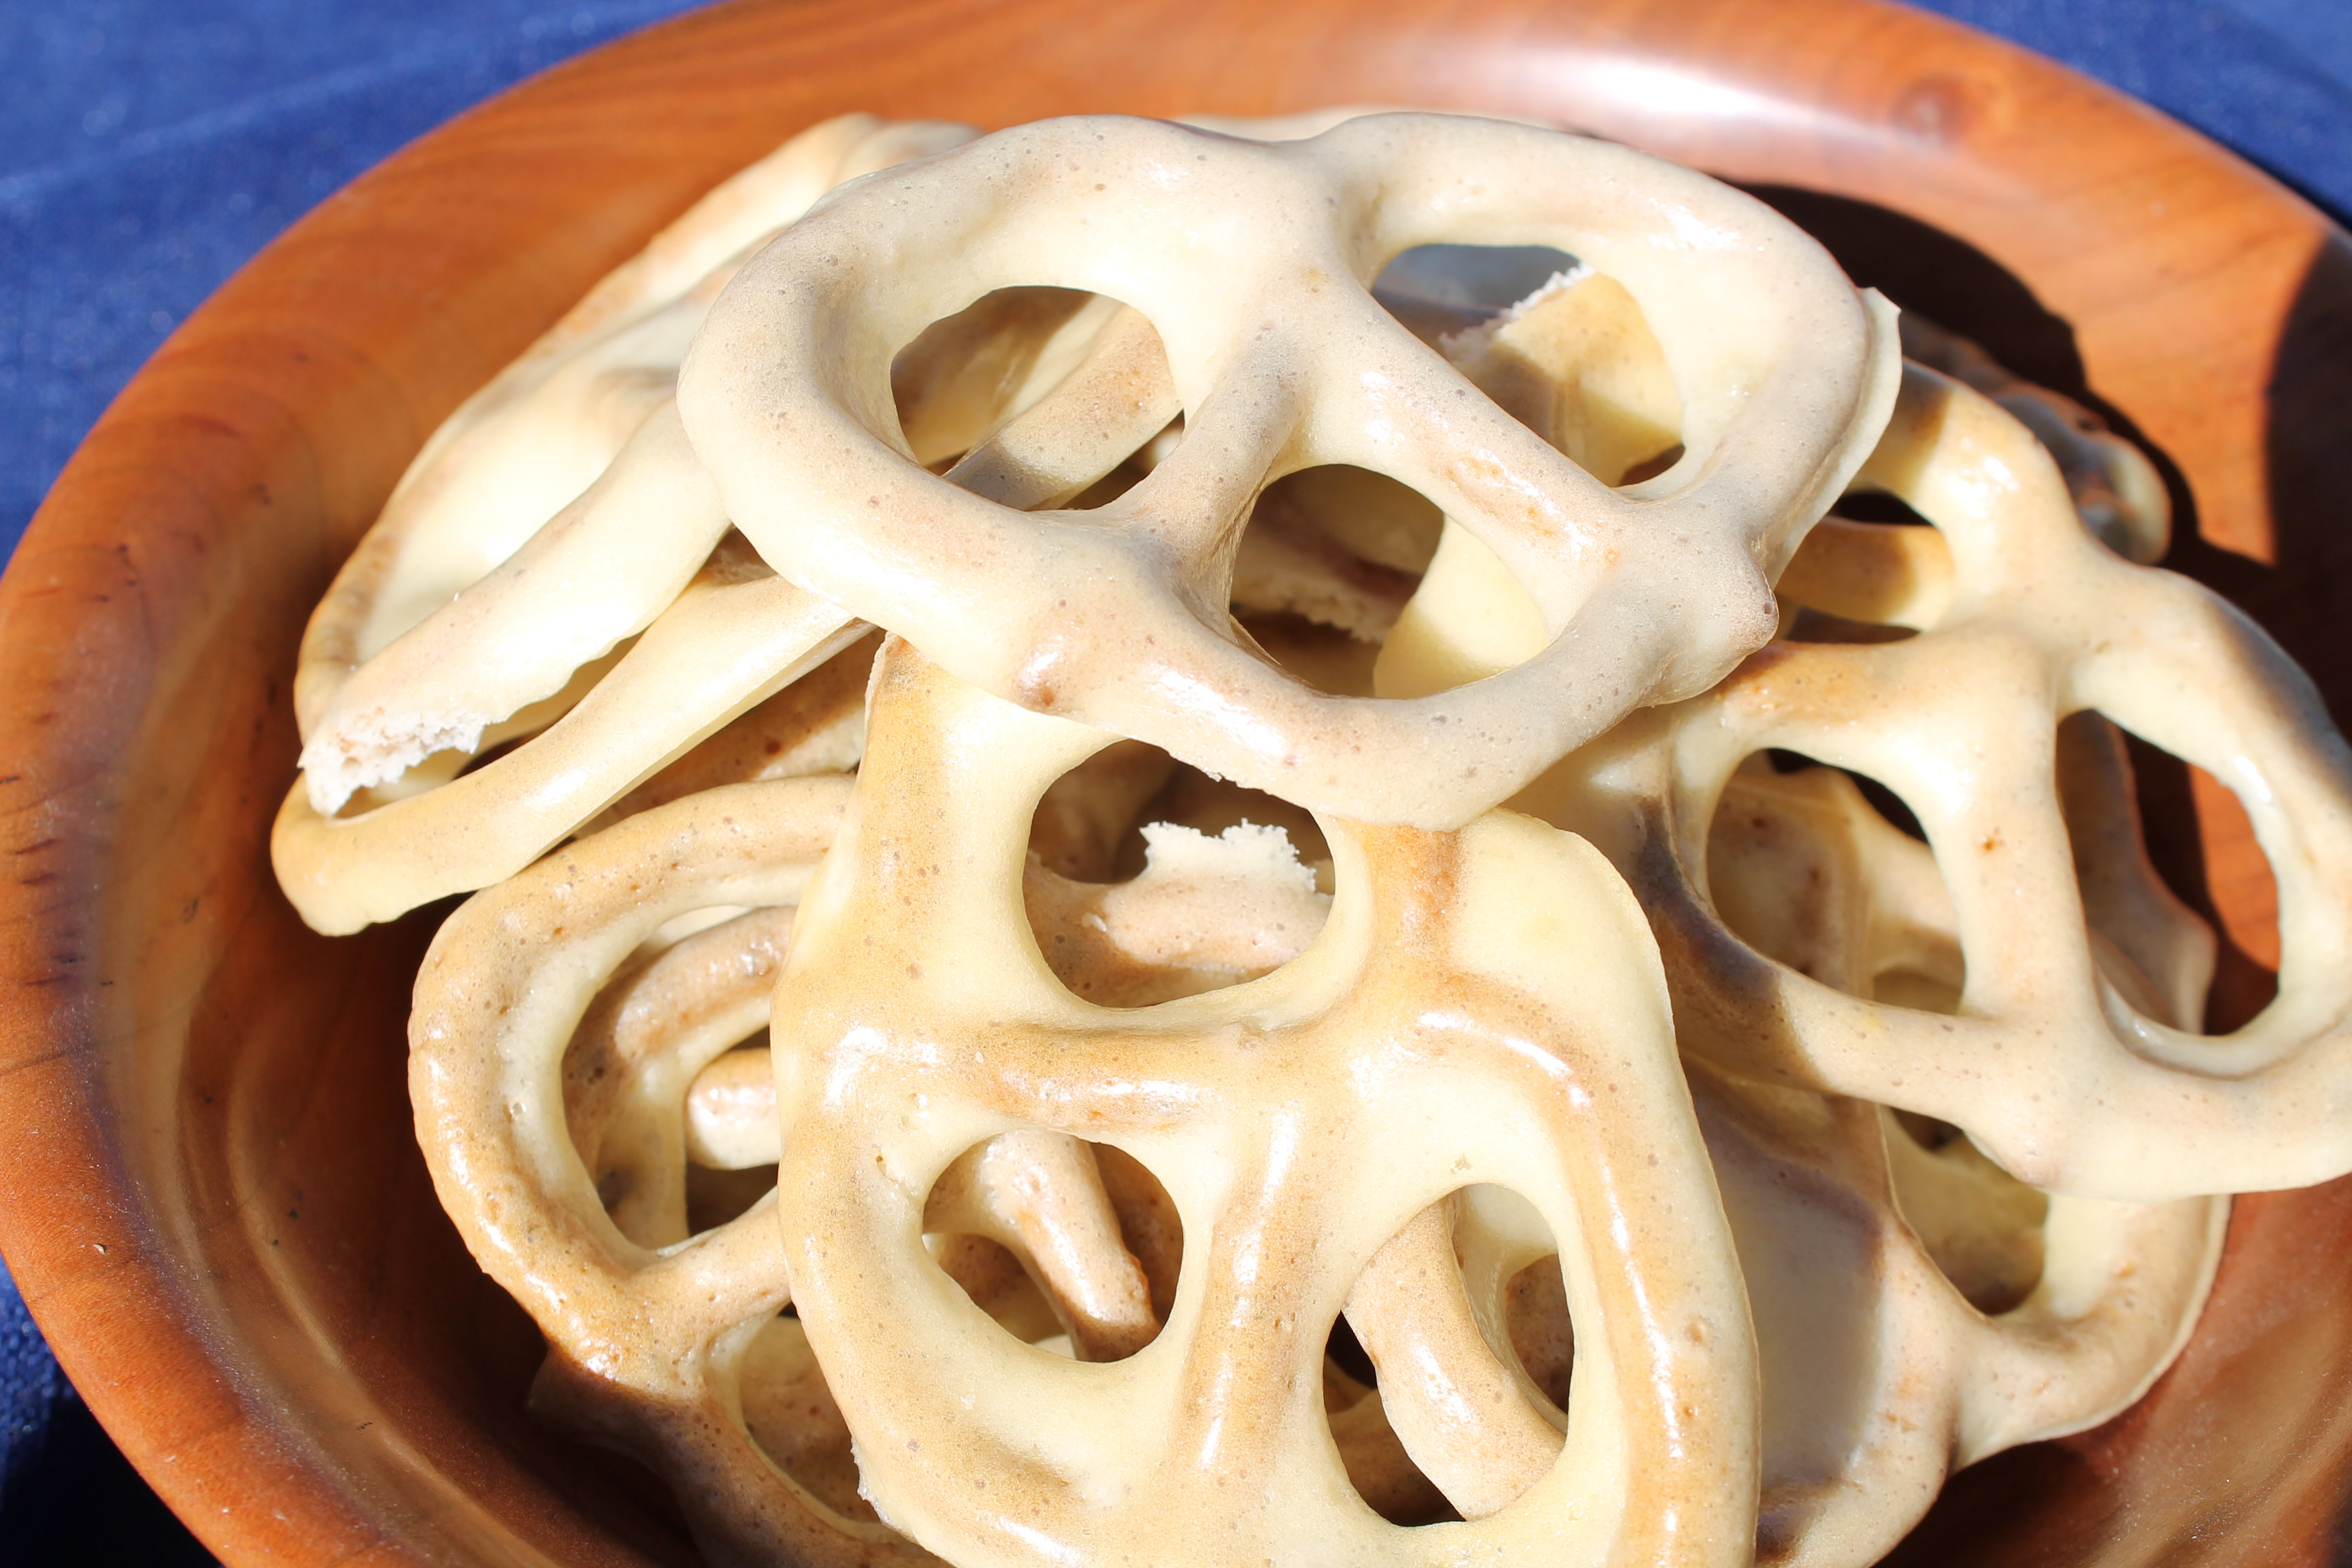 Yogurt Covered Pretzels Healthy  yogurt covered pretzels Archives healthy Vittles and Bits